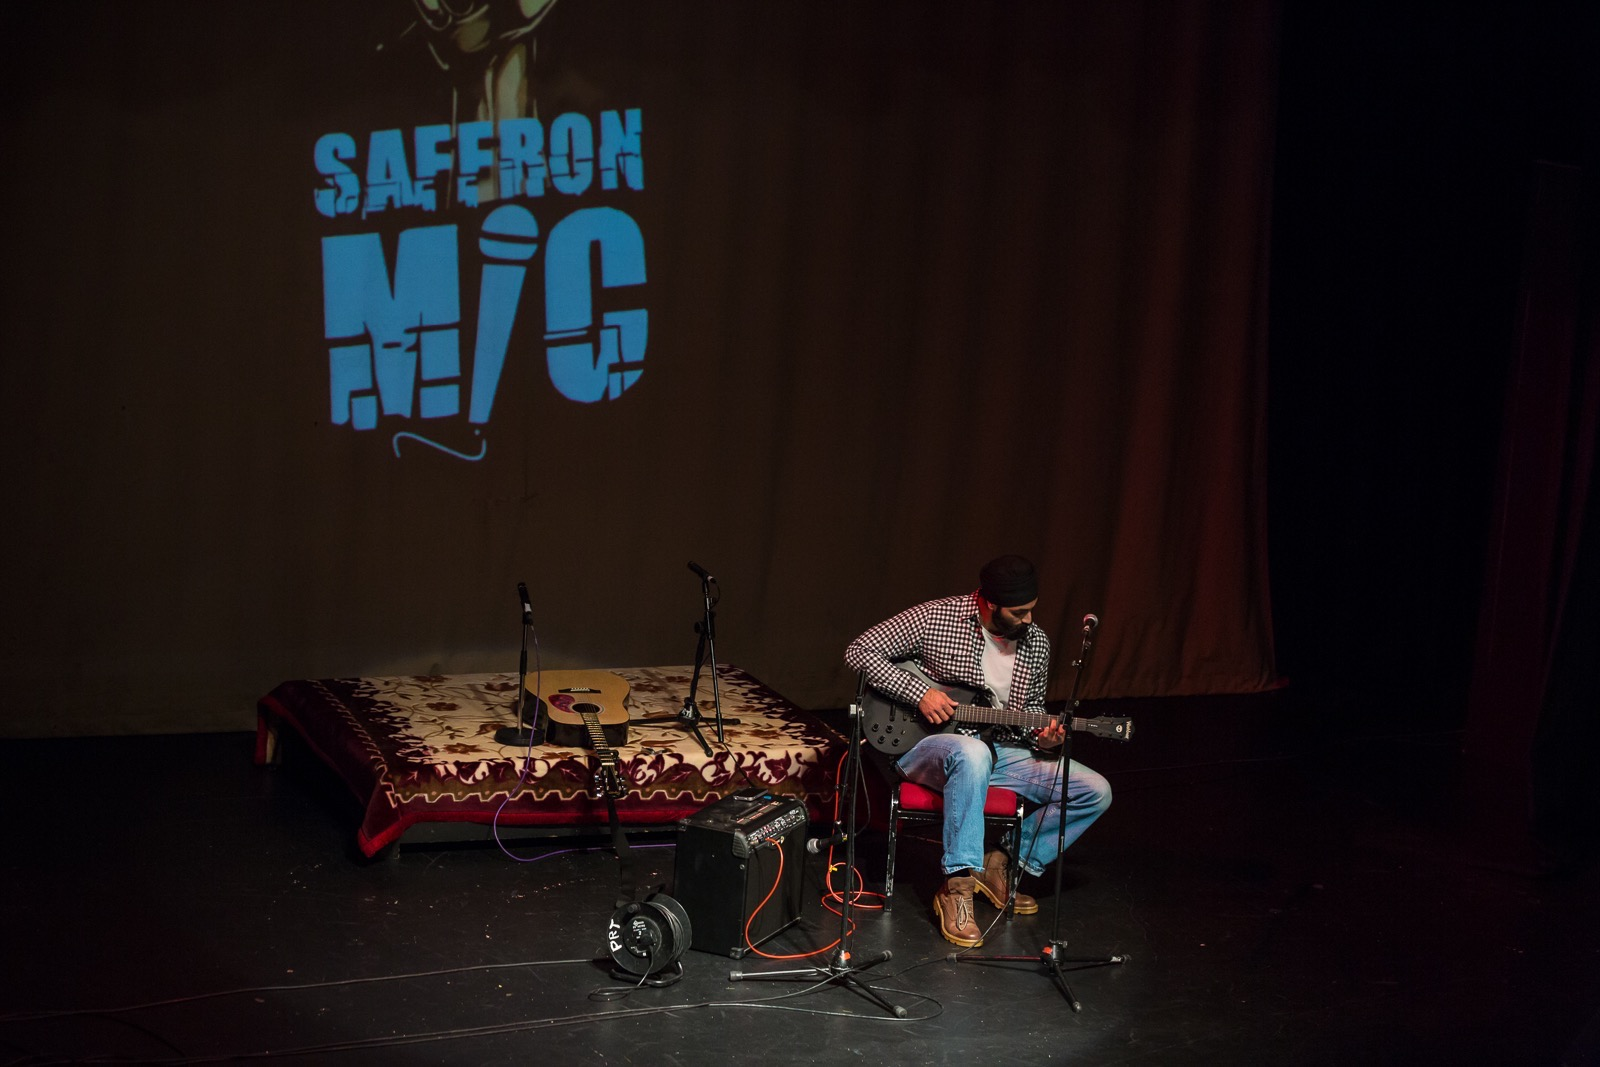 SAFFON MIC 4 - Shatter the Illusion